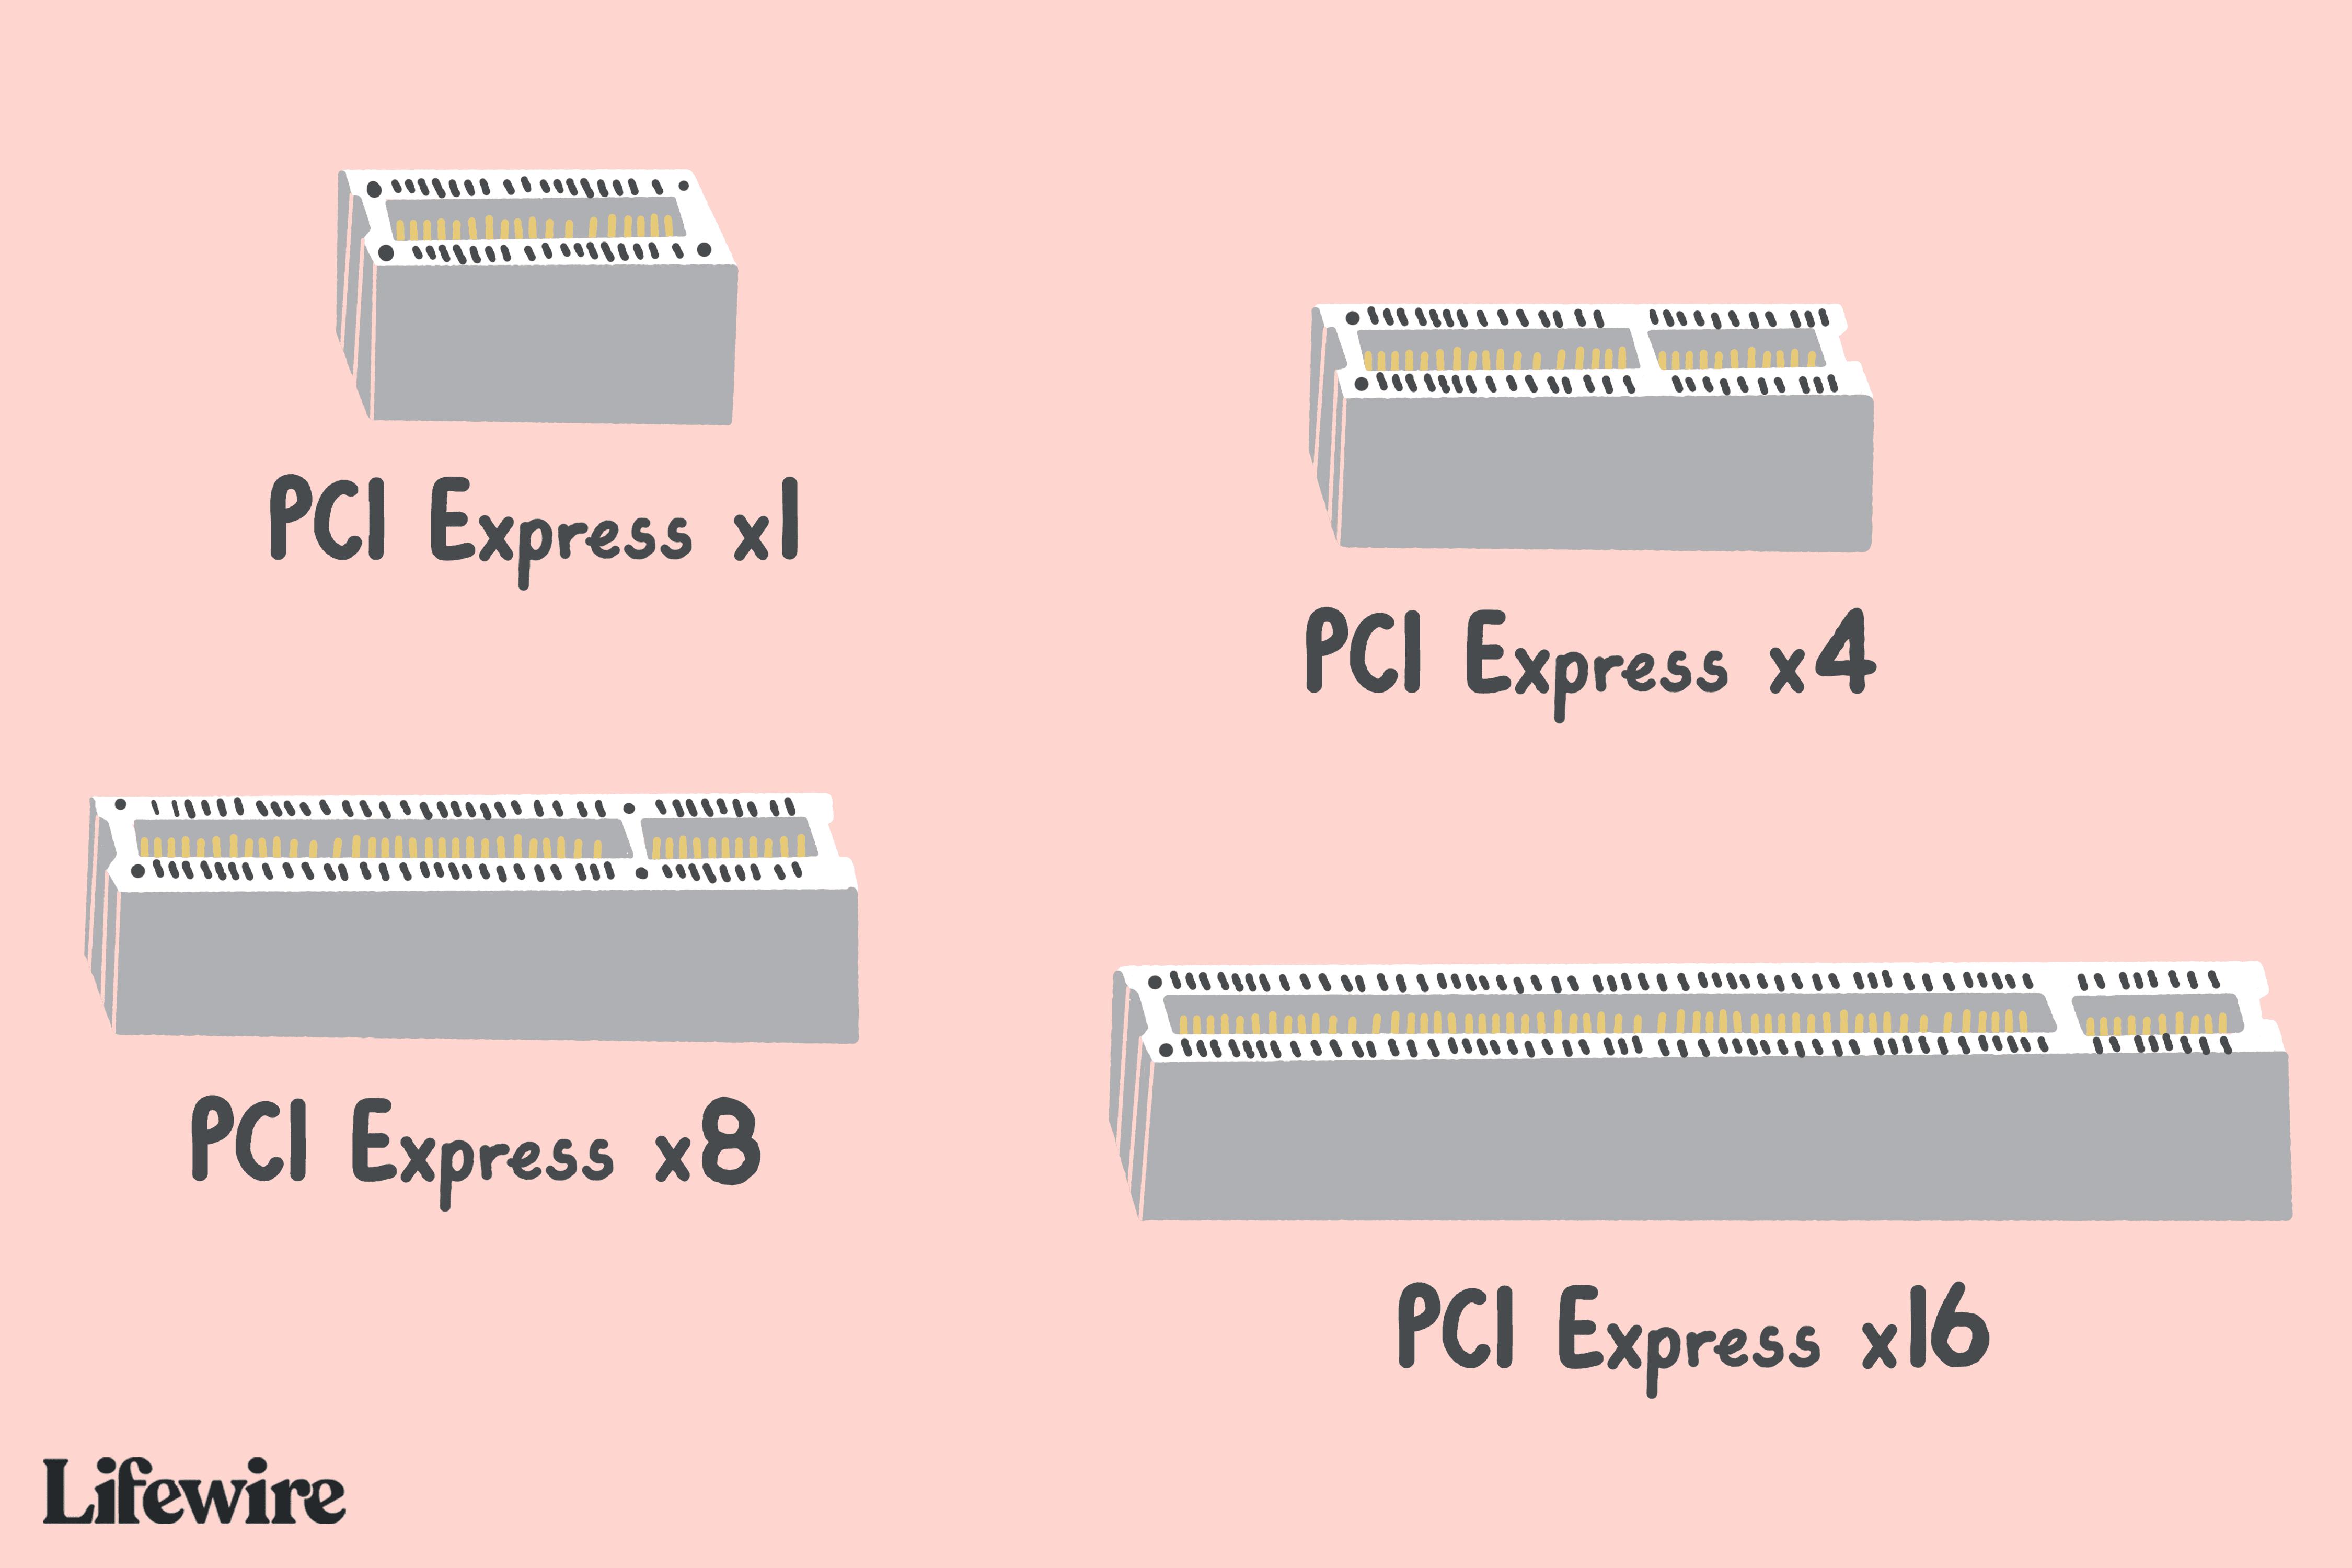 Illustration of 4 PCI Express connectors